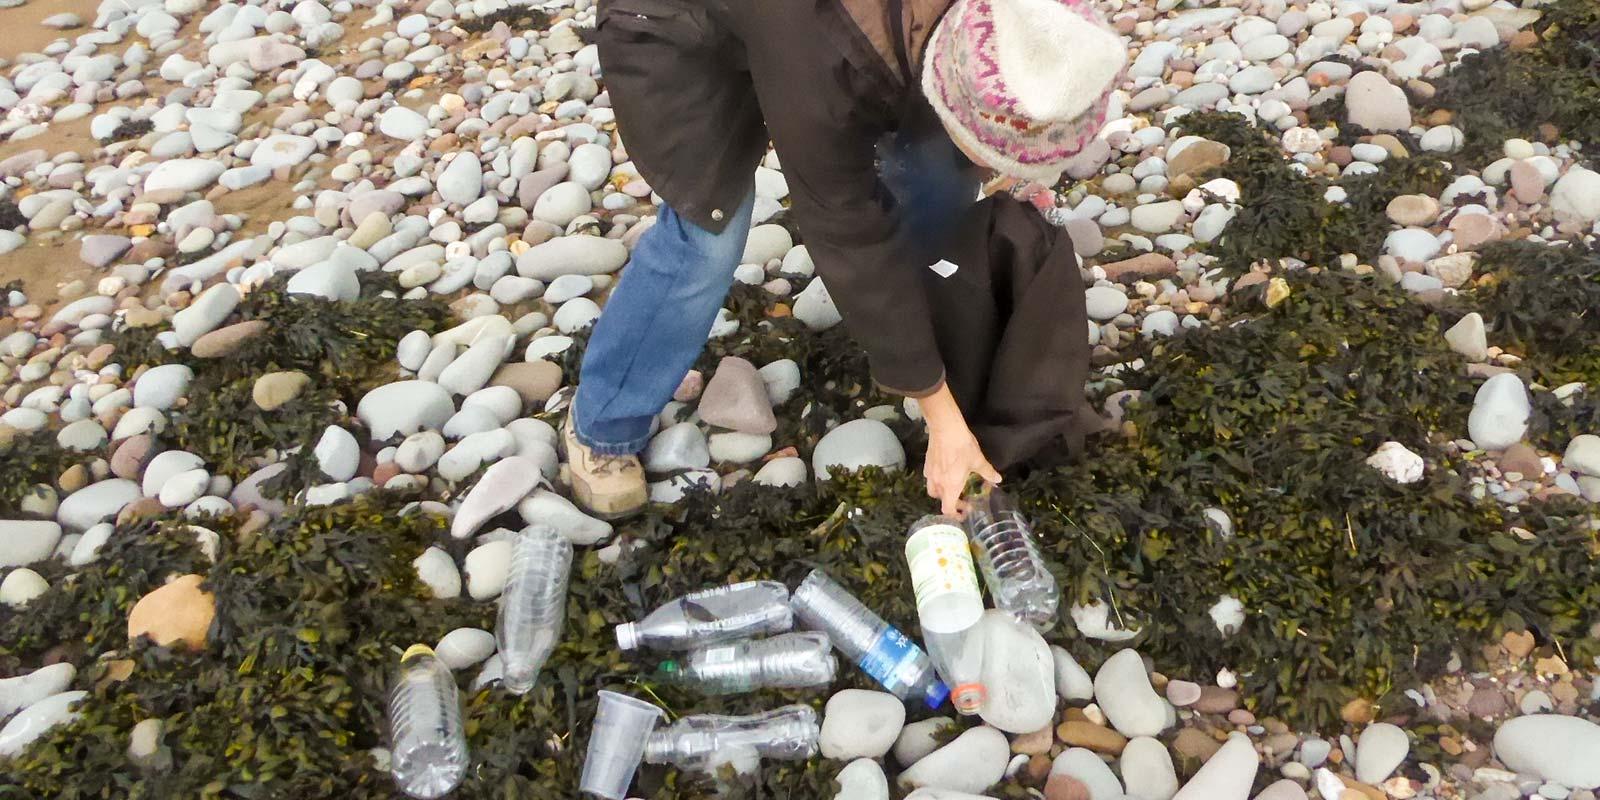 Siân Martin picking plastic bottles on a beach